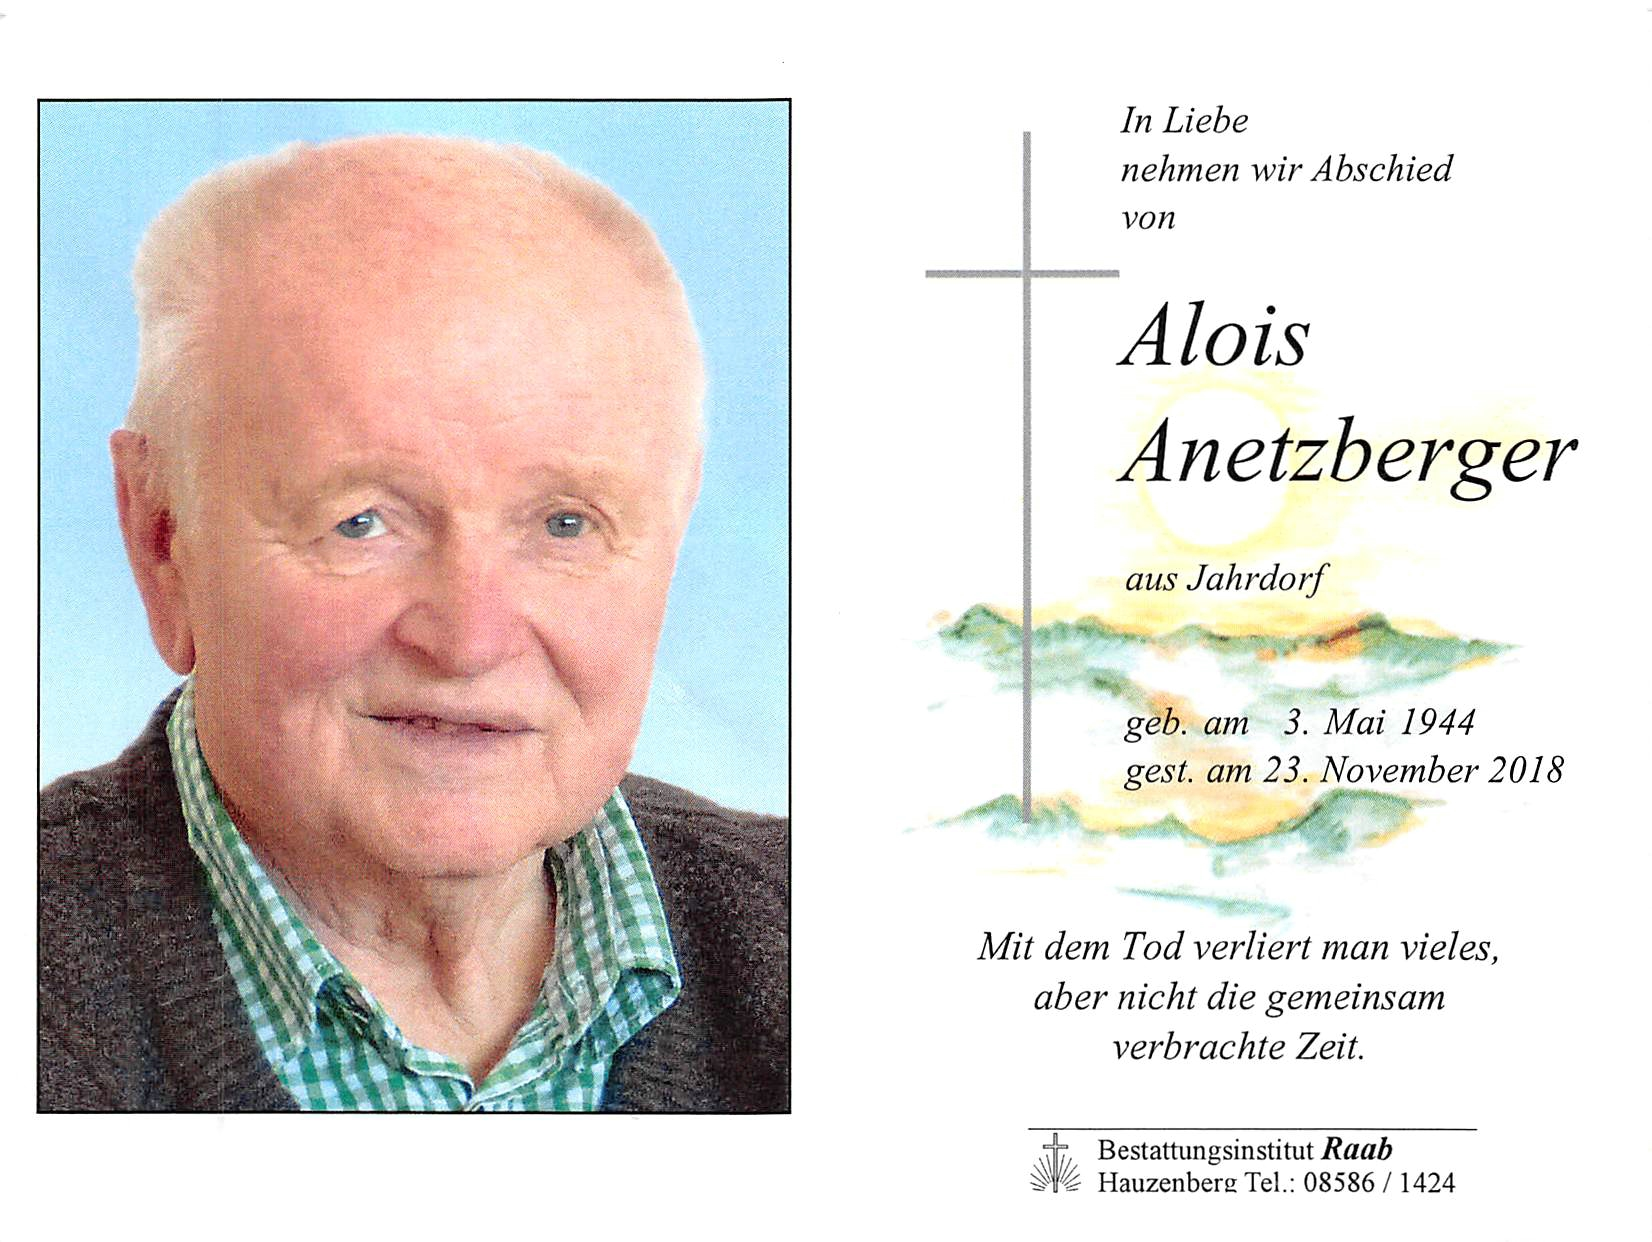 2018-11-23-Anetzberger-Alois-Jahrdorf